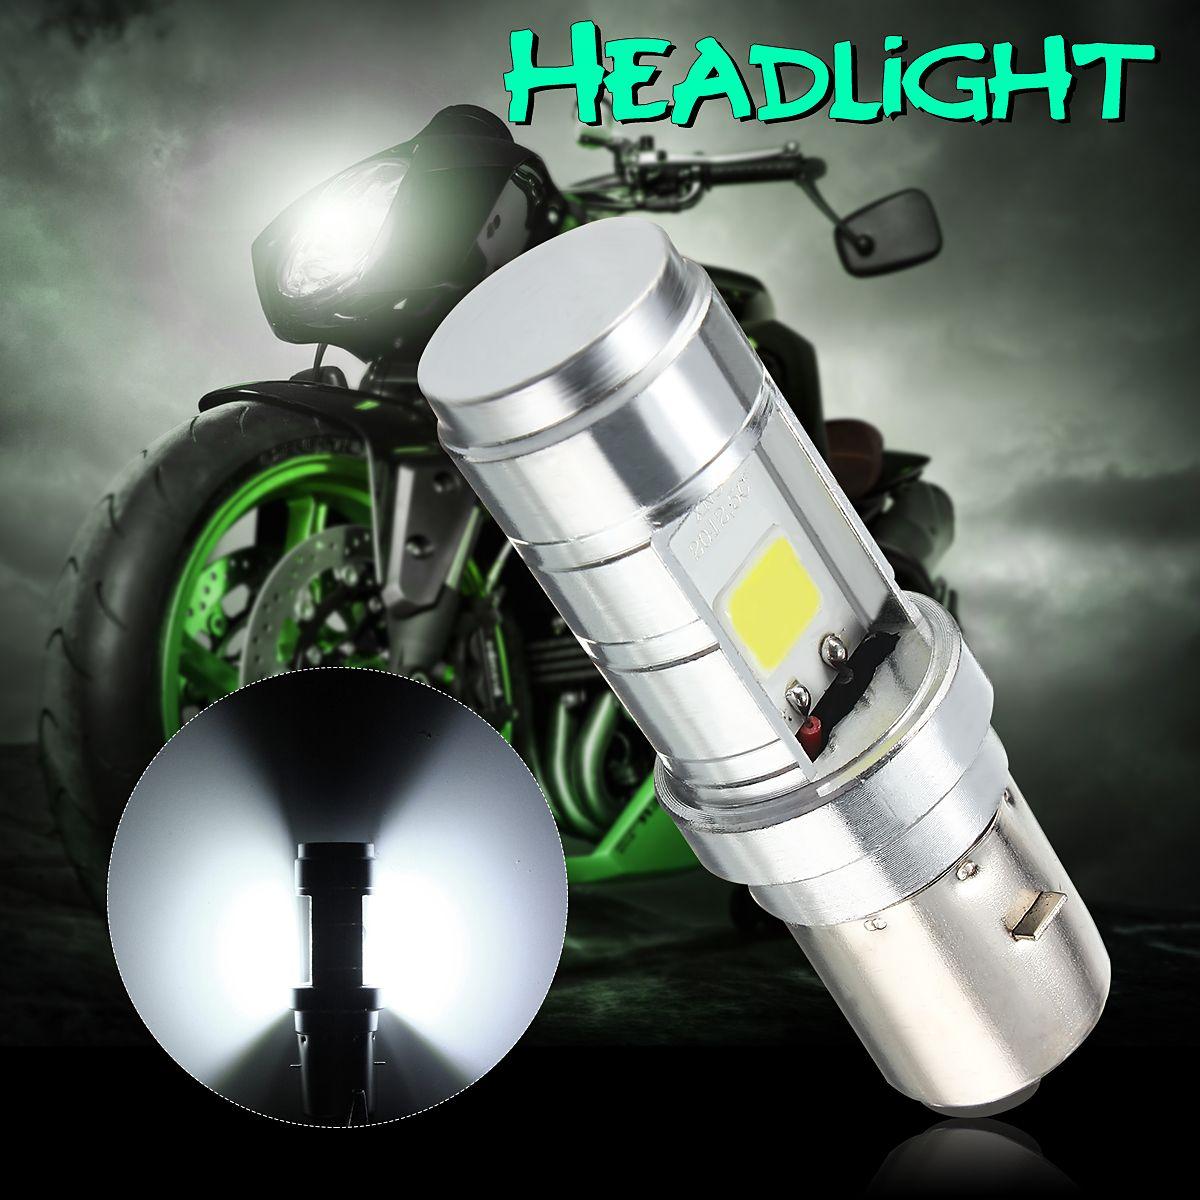 BA20D 10 W 1000LM LED Motorrad Moped ATV Scheinwerfer Birne Roller Accessoire 12 V-24 V Weiß Motorrad Kopf lampe